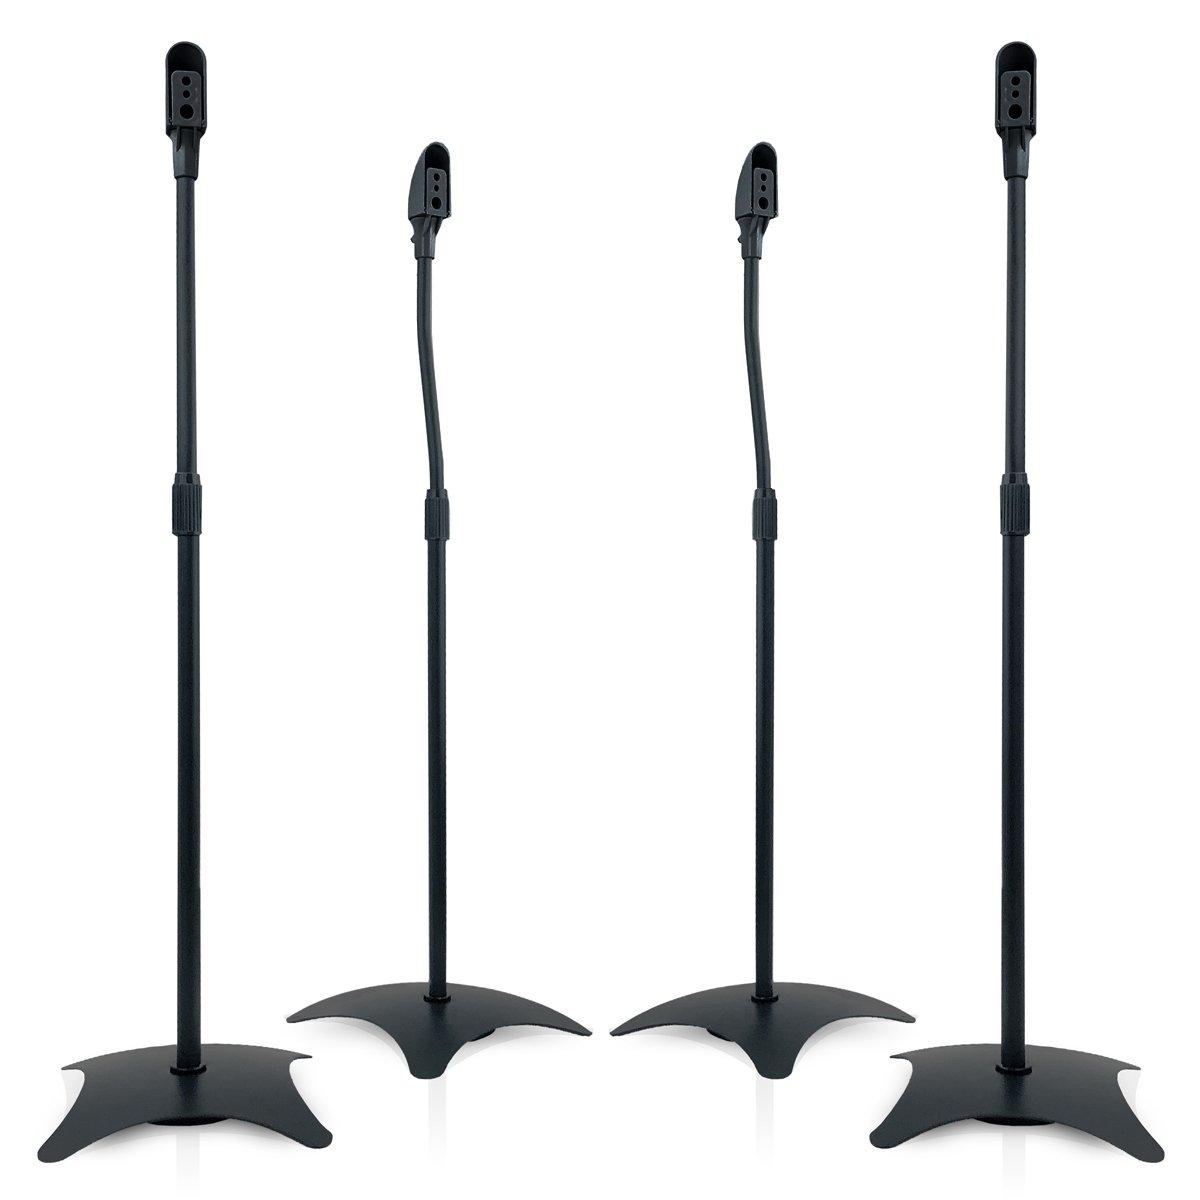 9HORN 5.1 Metal Speaker Stands Kit Height Adjustable (Black, 2 Pairs)